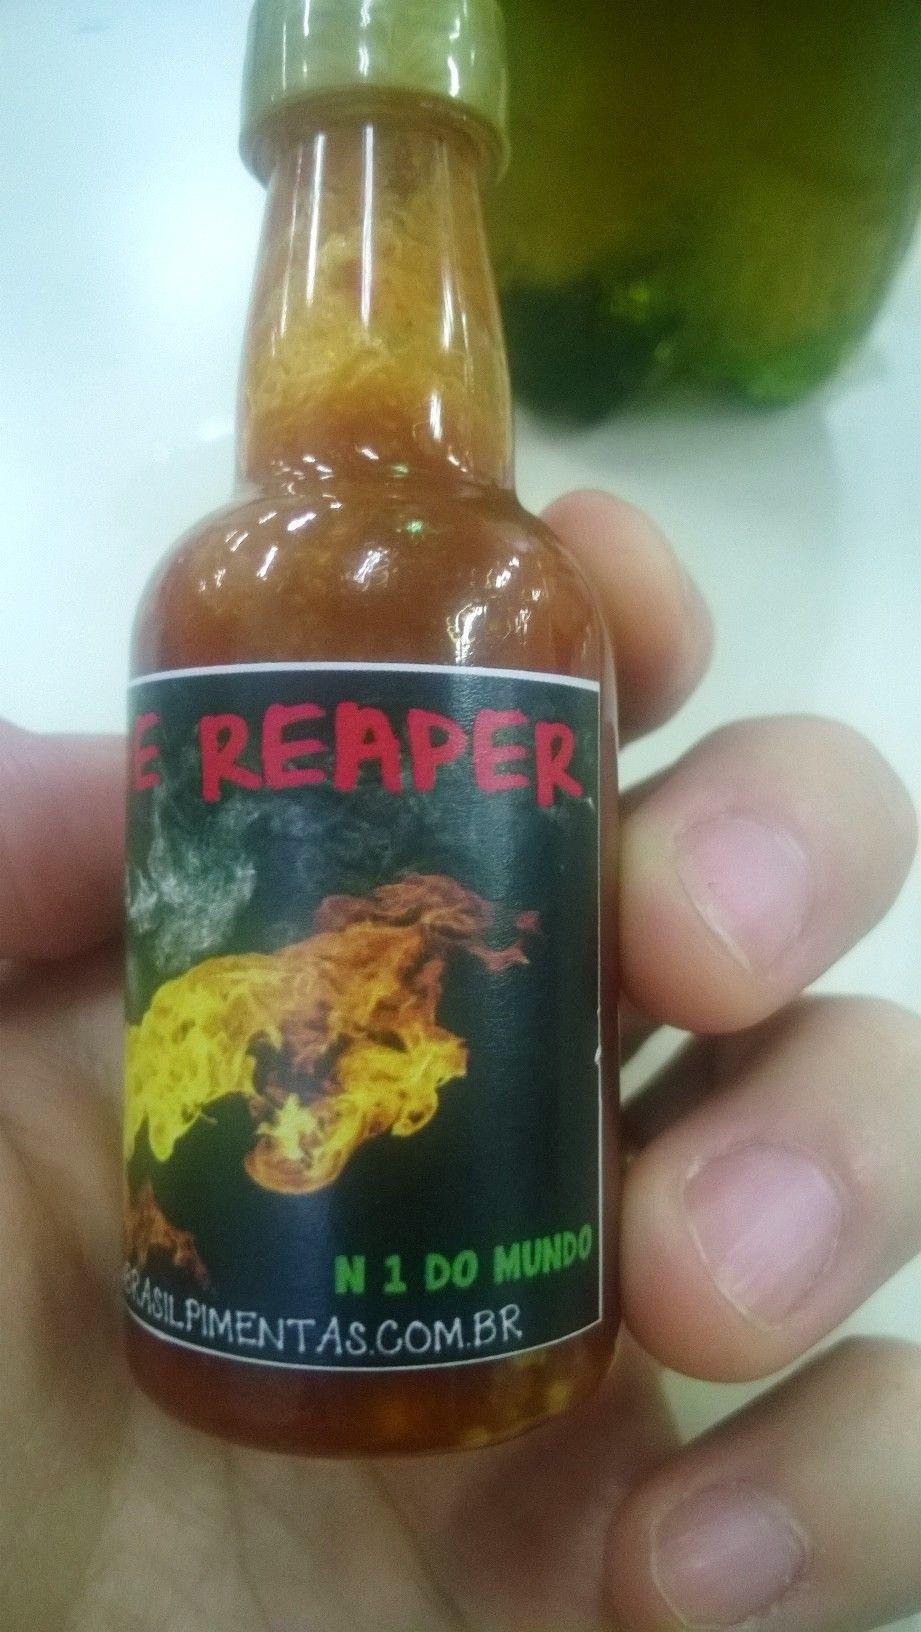 Carolina Reaper Pepper Sauce Made By Brasil Pimentas